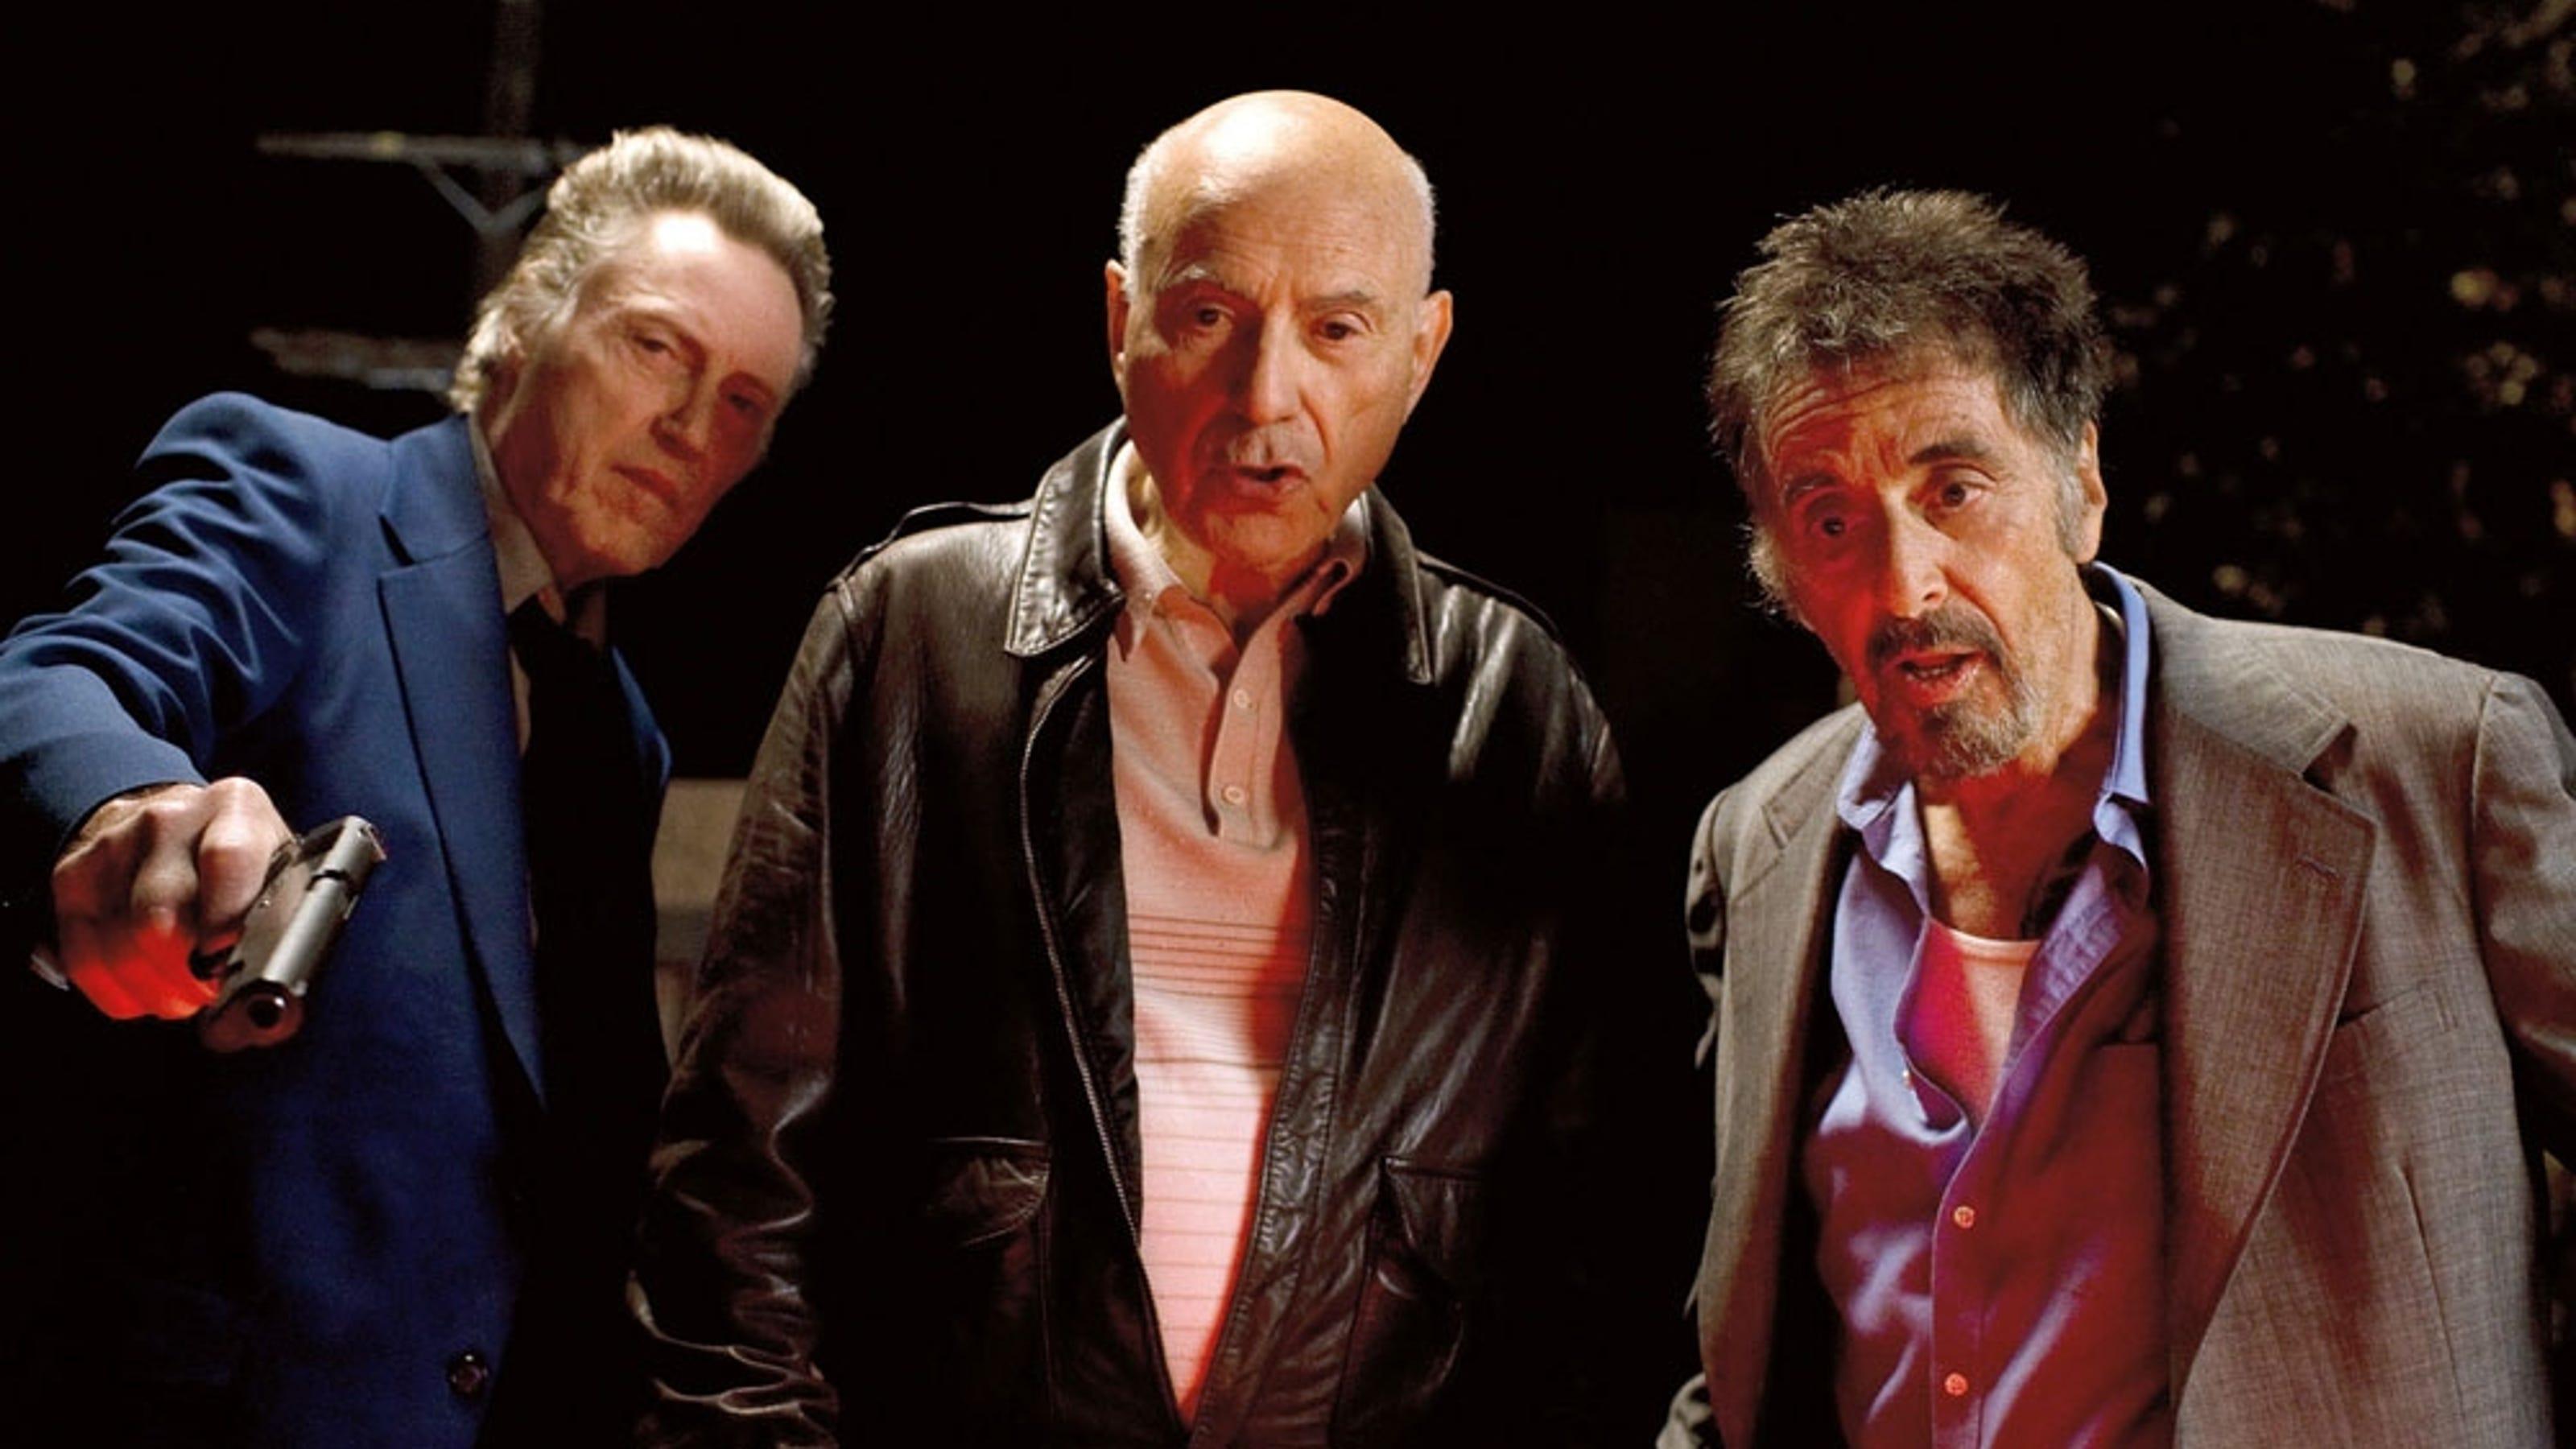 Plot twists handcuff 'Stand Up Guys' Pacino, Arkin